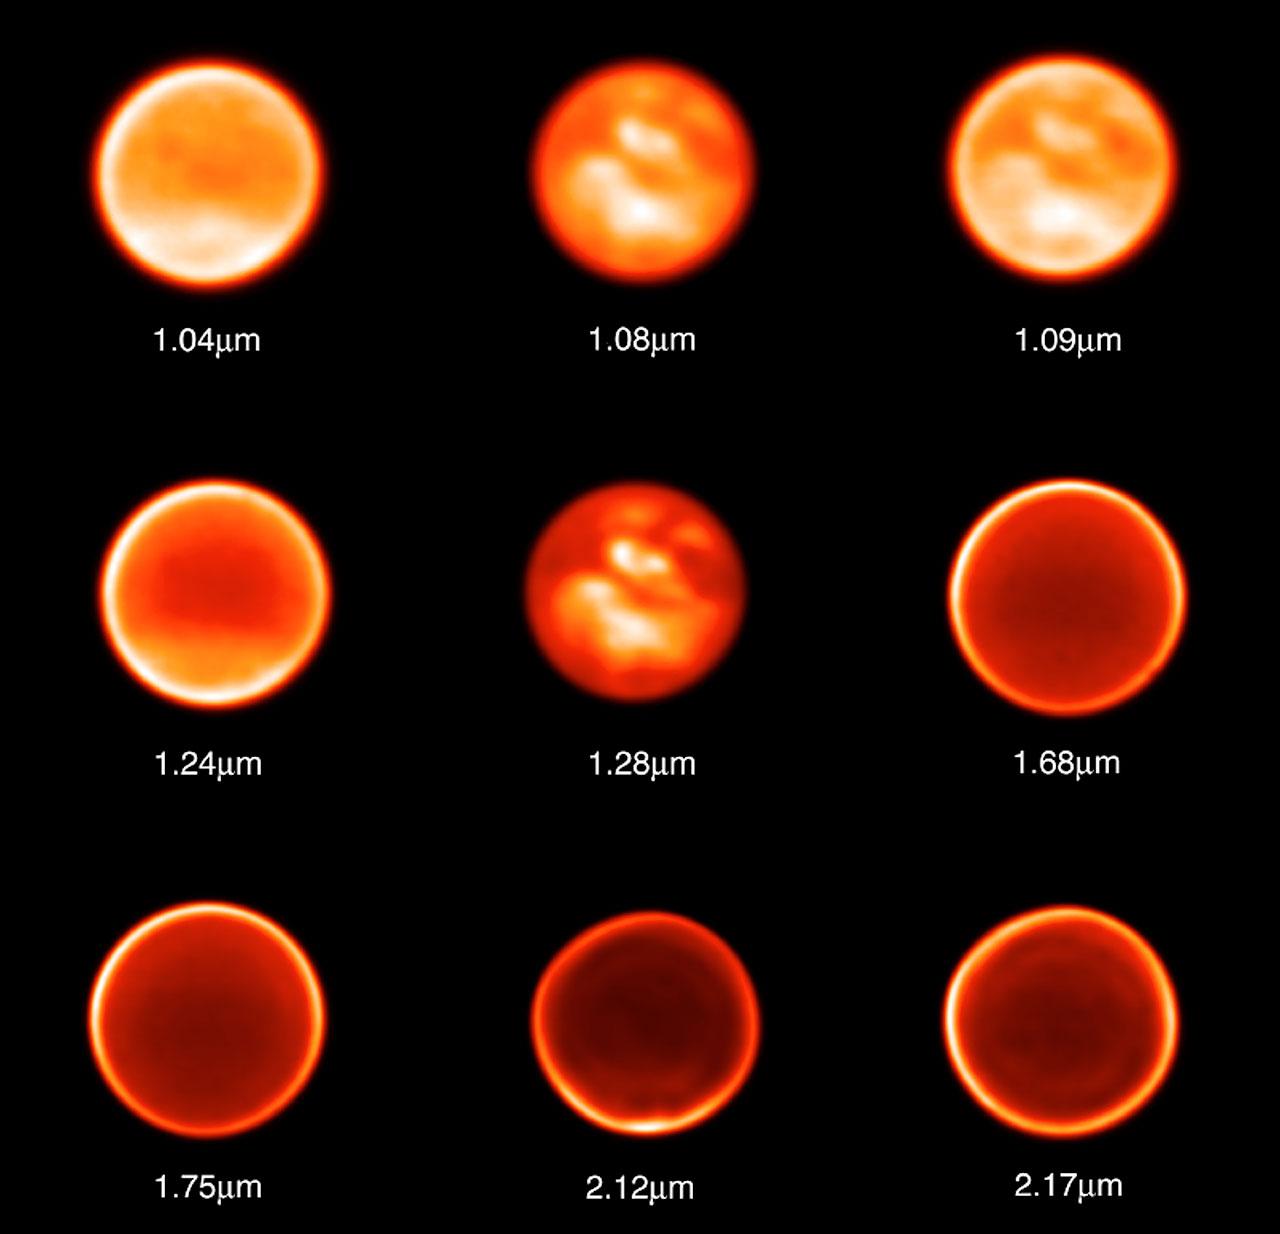 Titan Observed Through Nine Different Filters on November 26, 2002